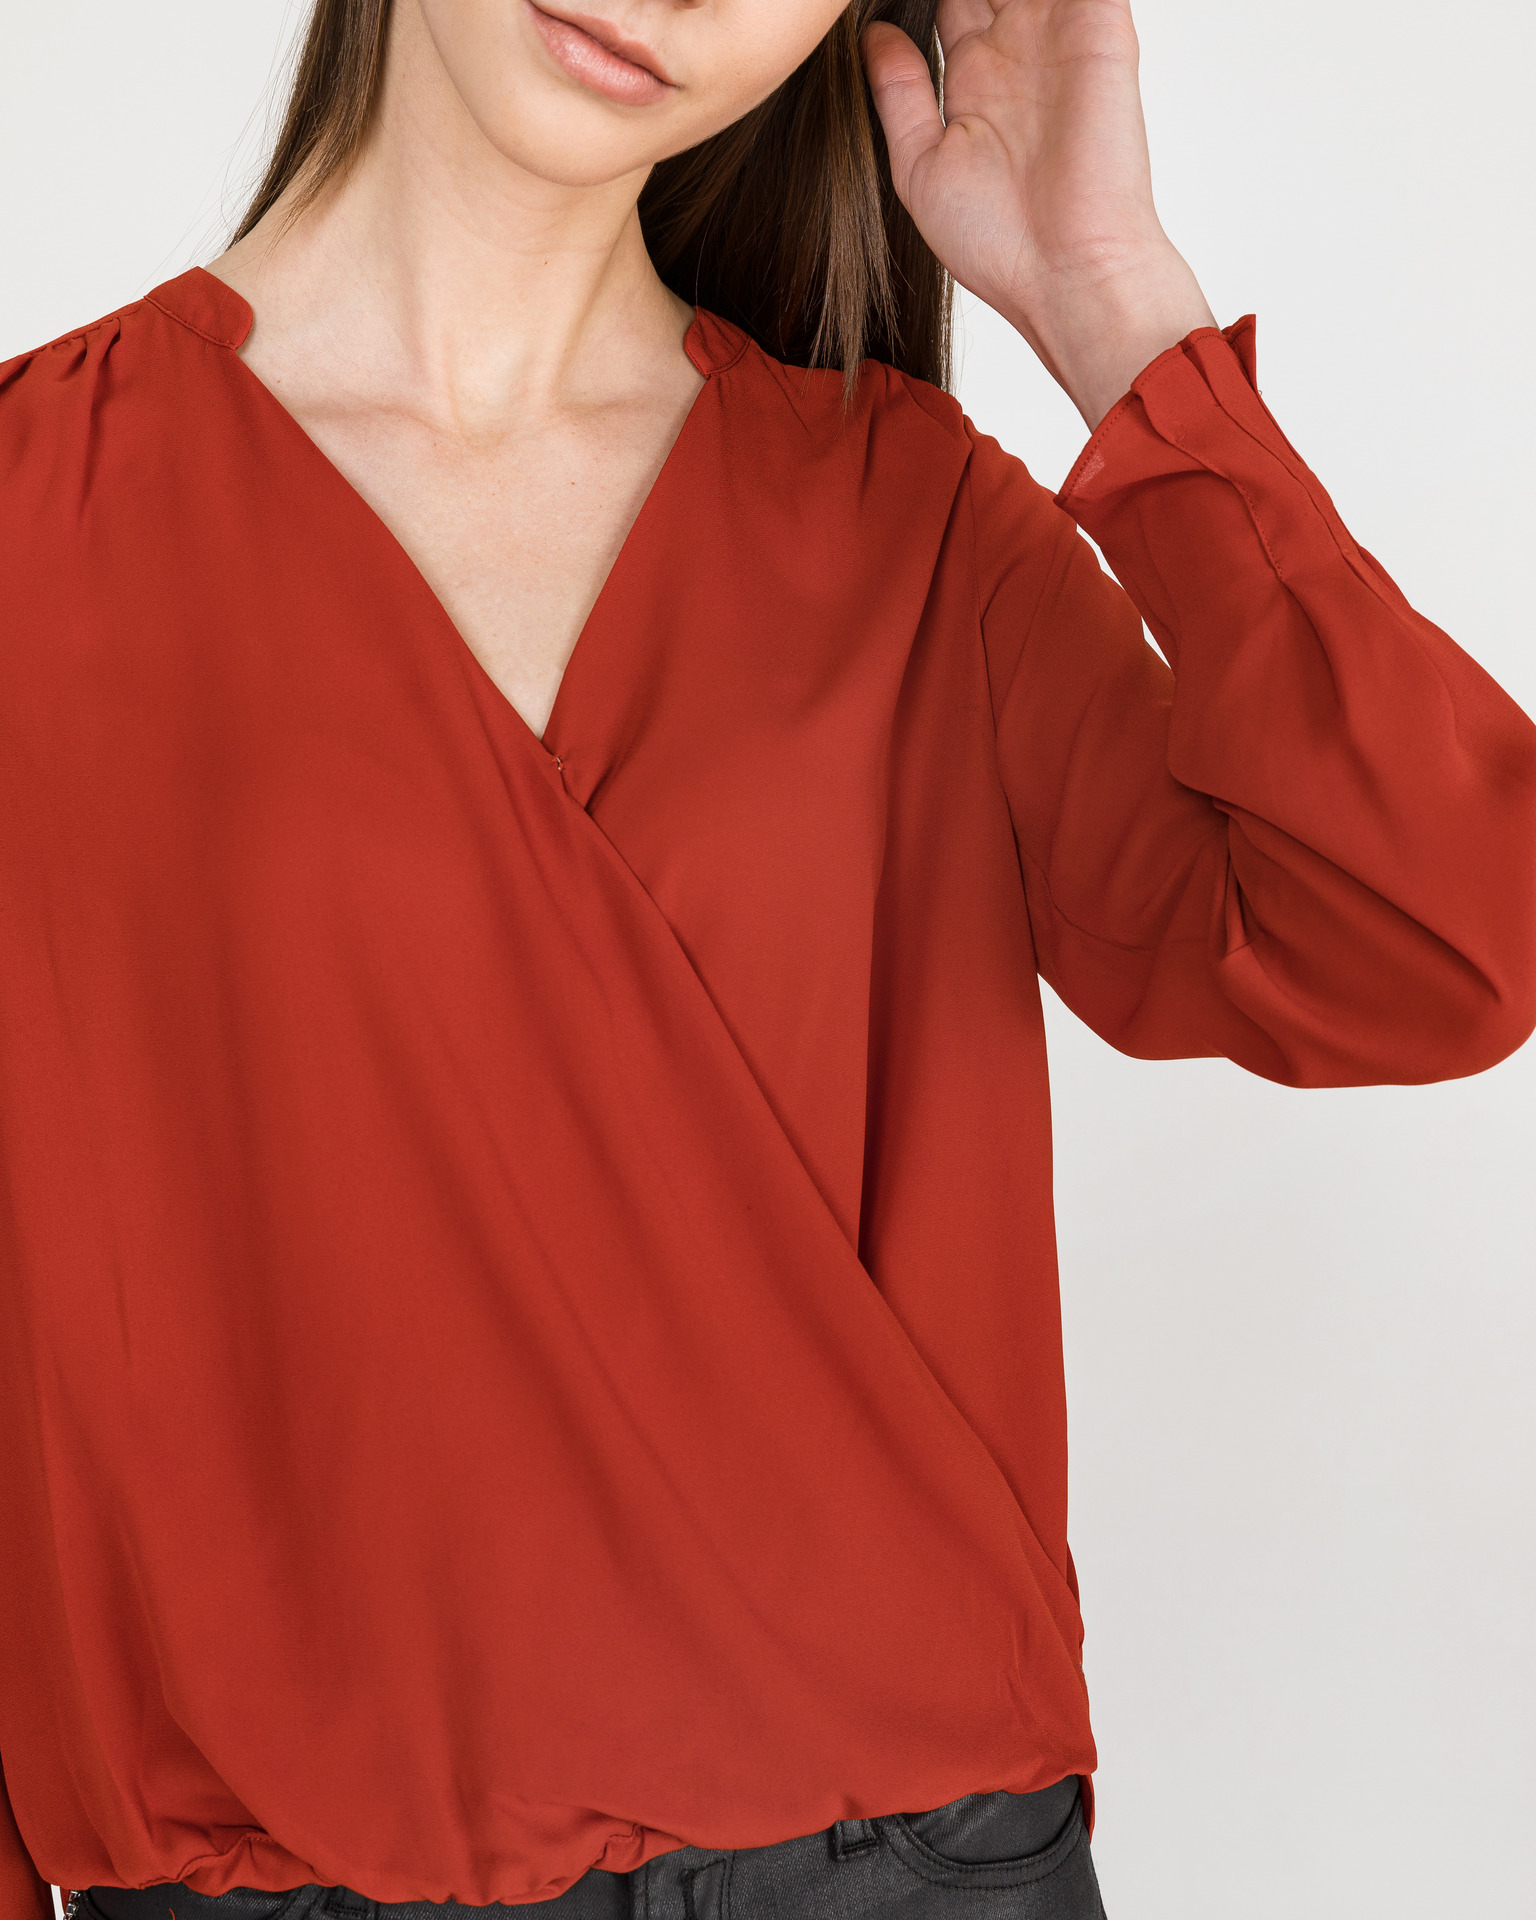 Scotch & Soda Women's blouse red